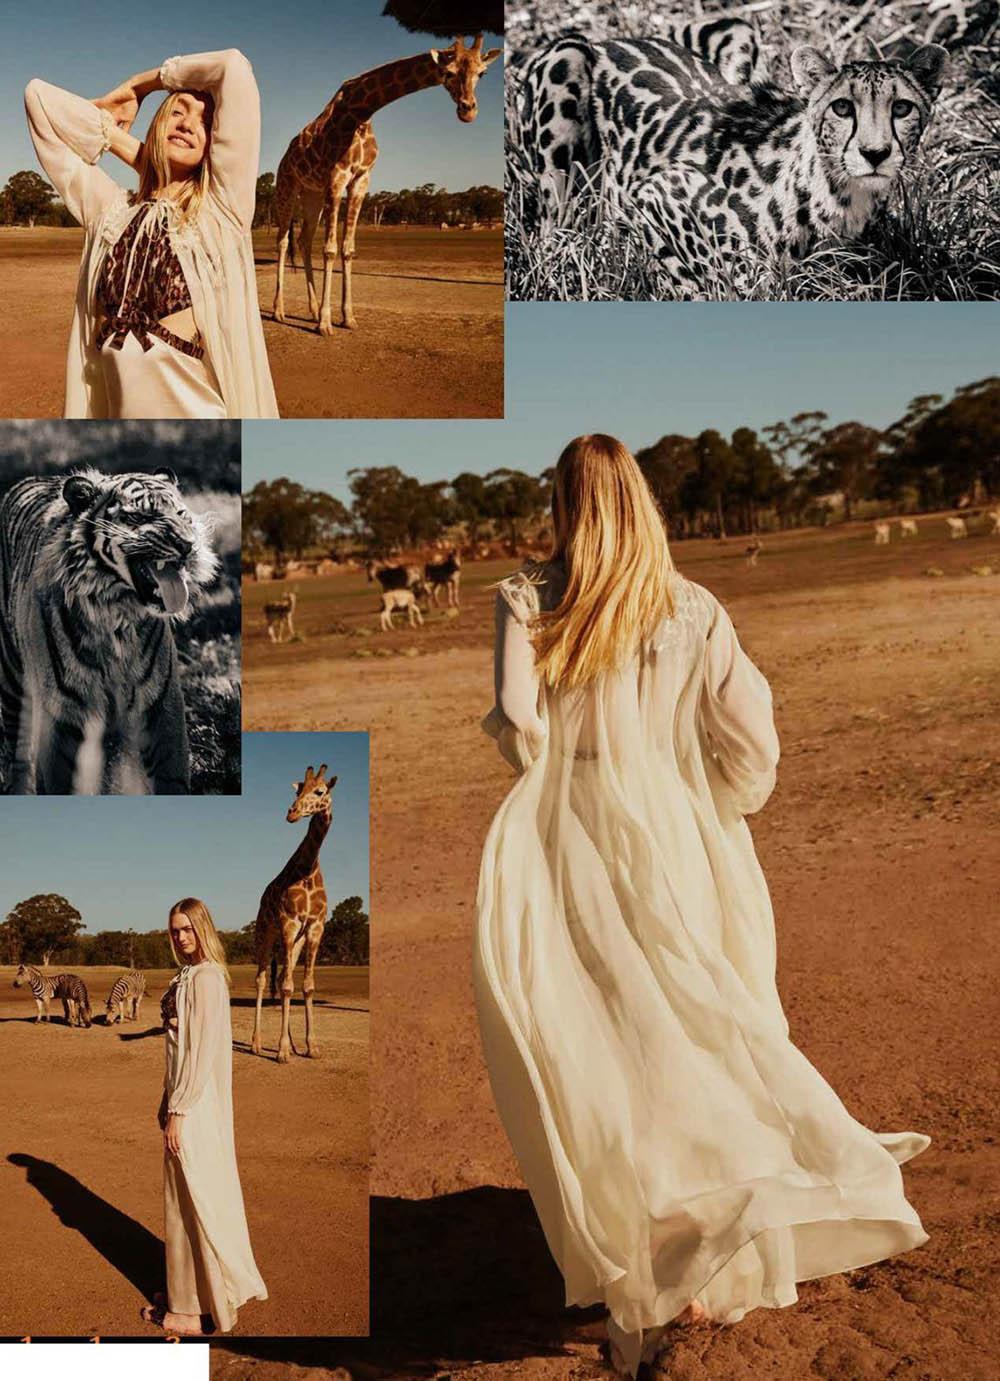 Gemma-Ward-covers-Harper's-Bazaar-Australia-December-2018-by-Georges-Antoni-18.jpg